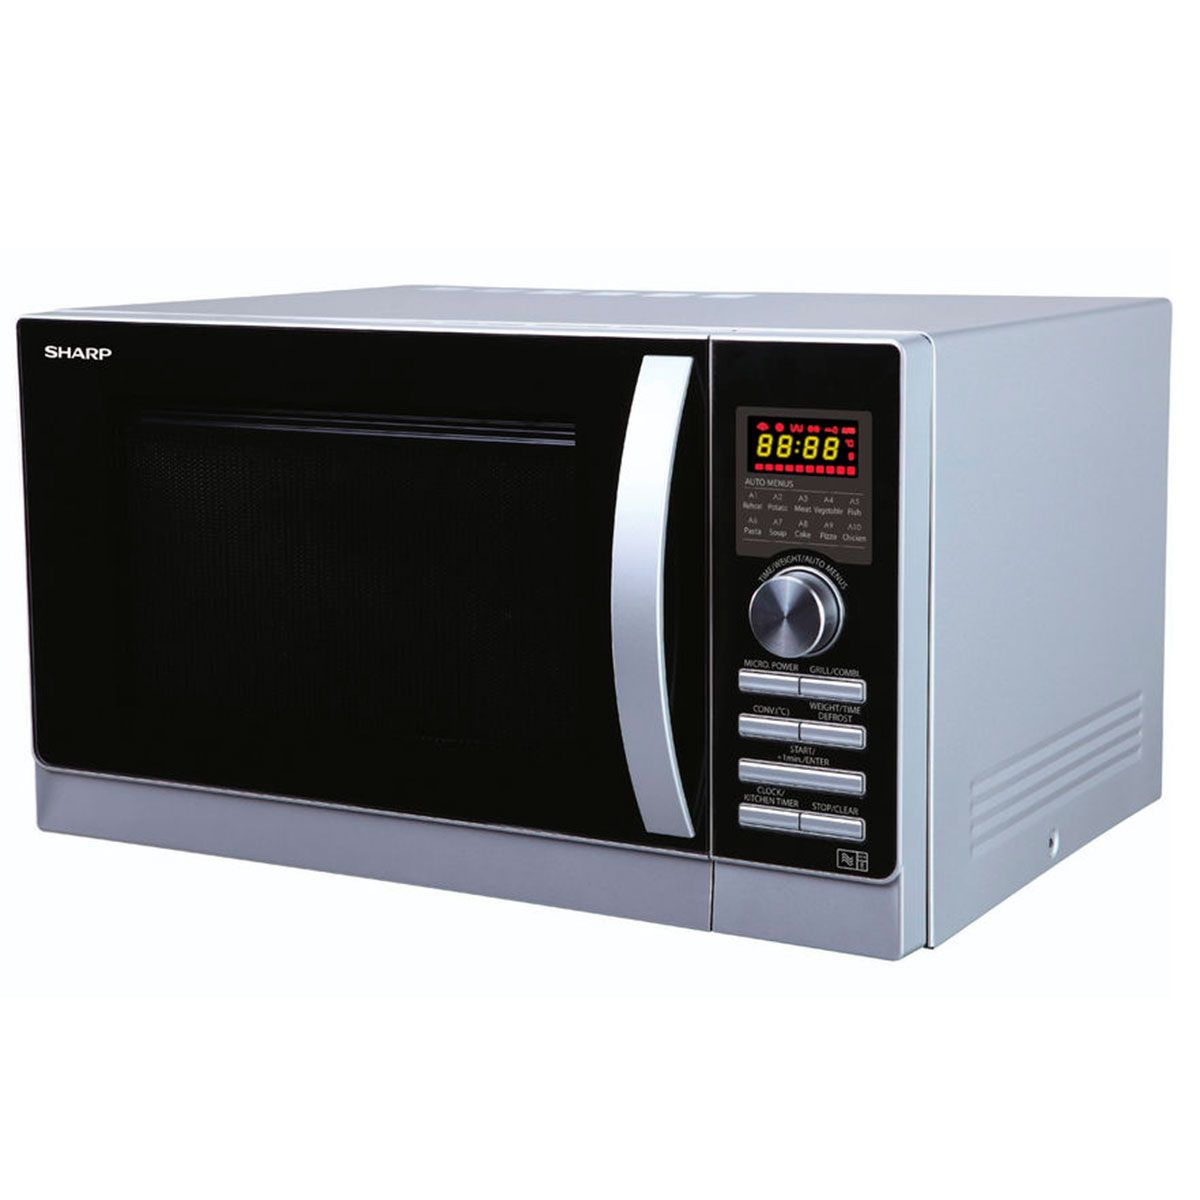 Sharp R 842SLM Microwave review